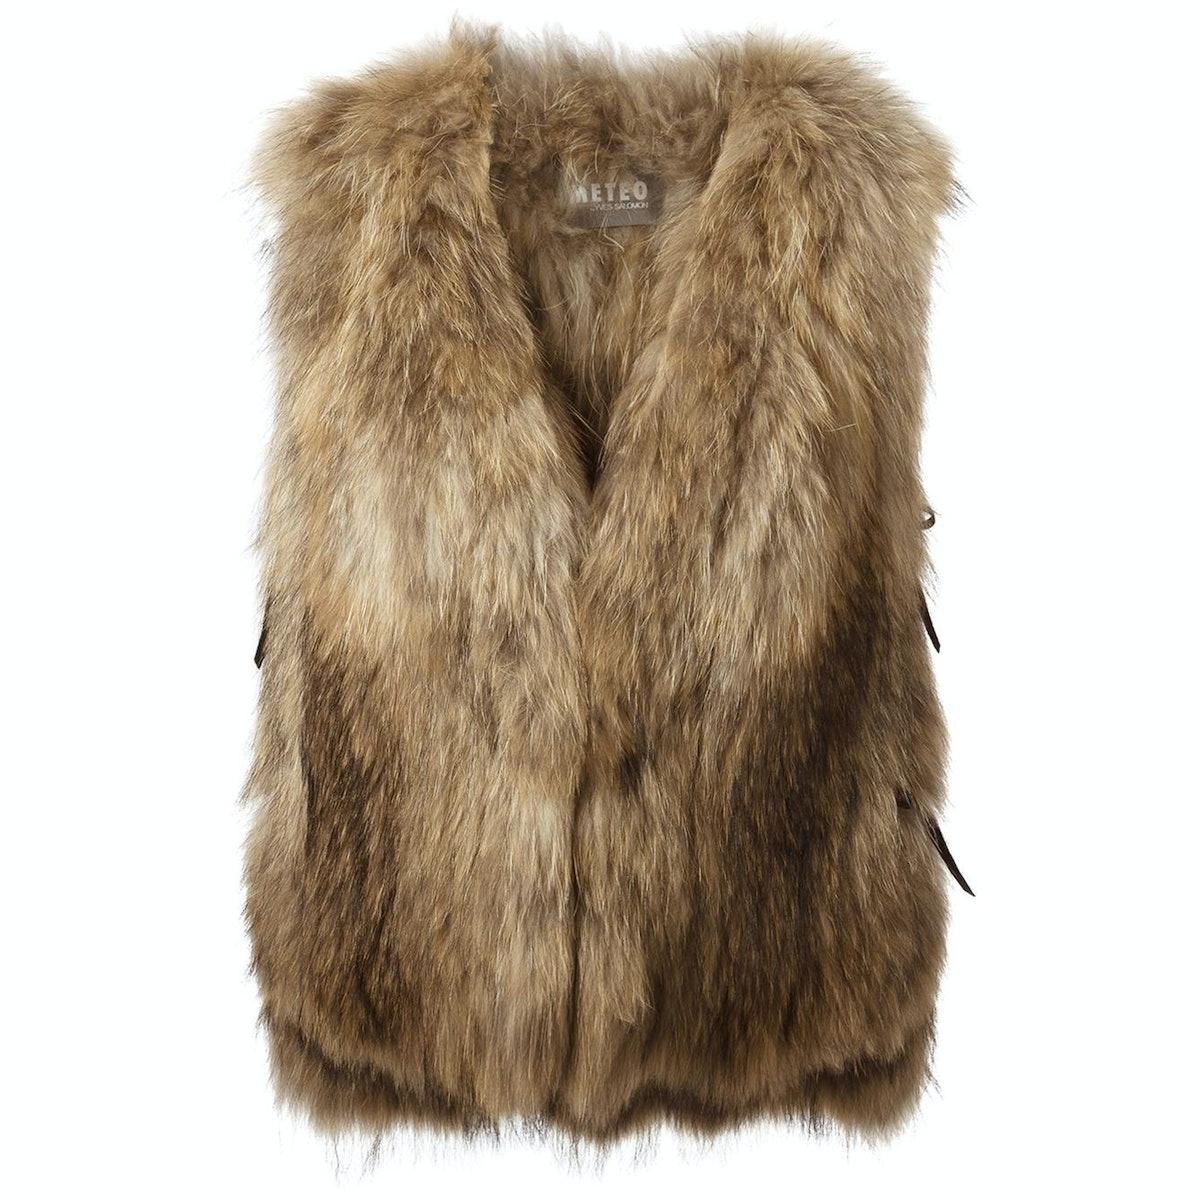 Meteo fur vest